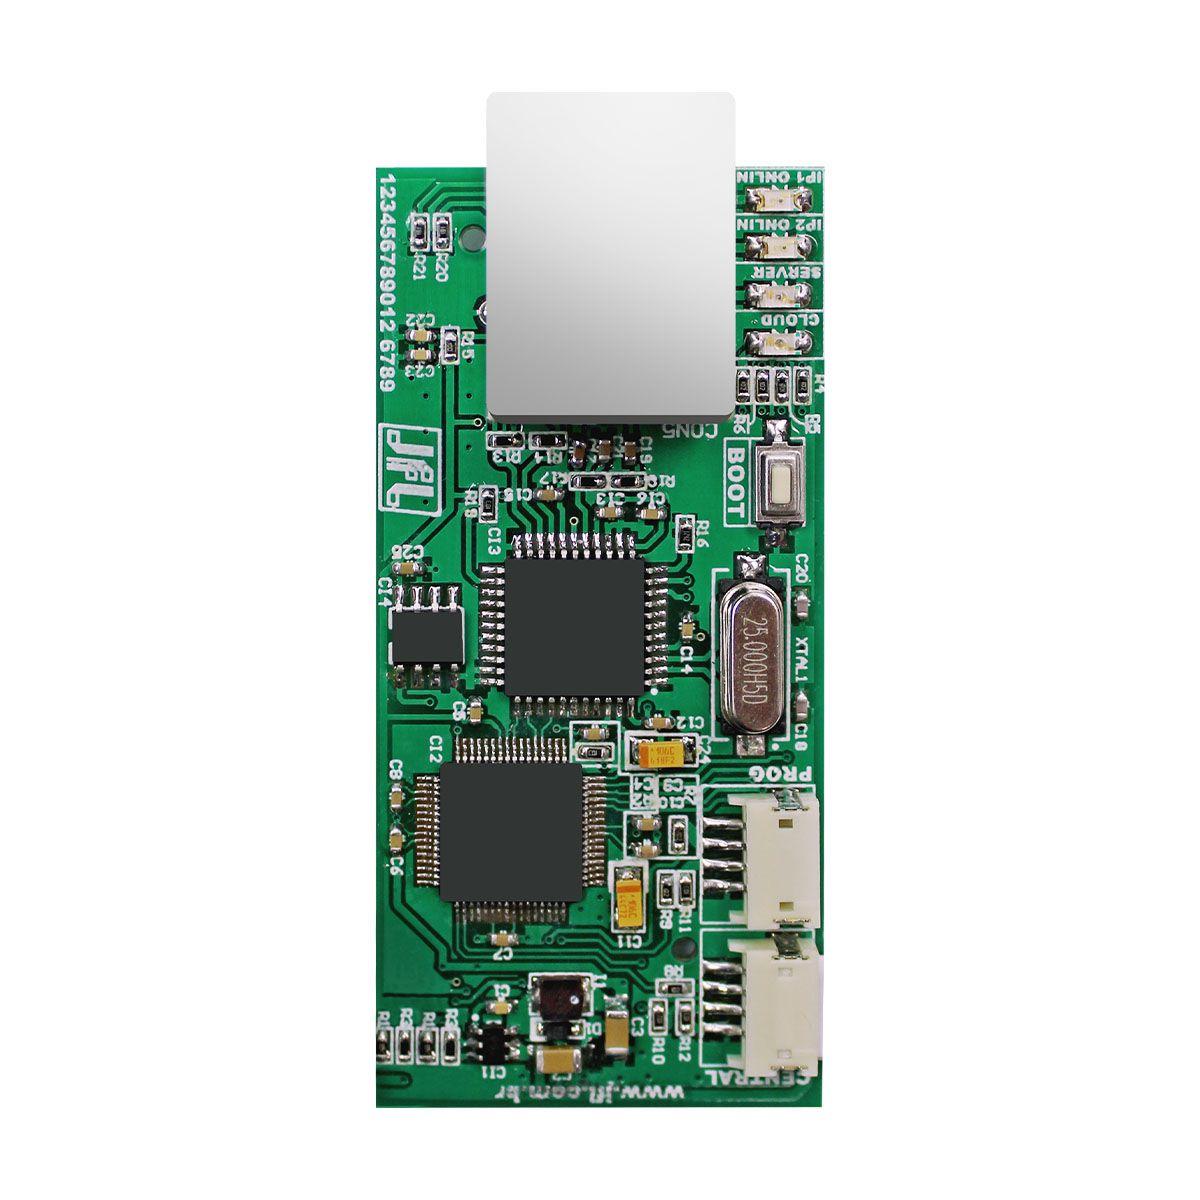 Kit Alarme Jfl por Aplicativo SmartCloud 18 Sensor Shc Fit e IrPet 530sf